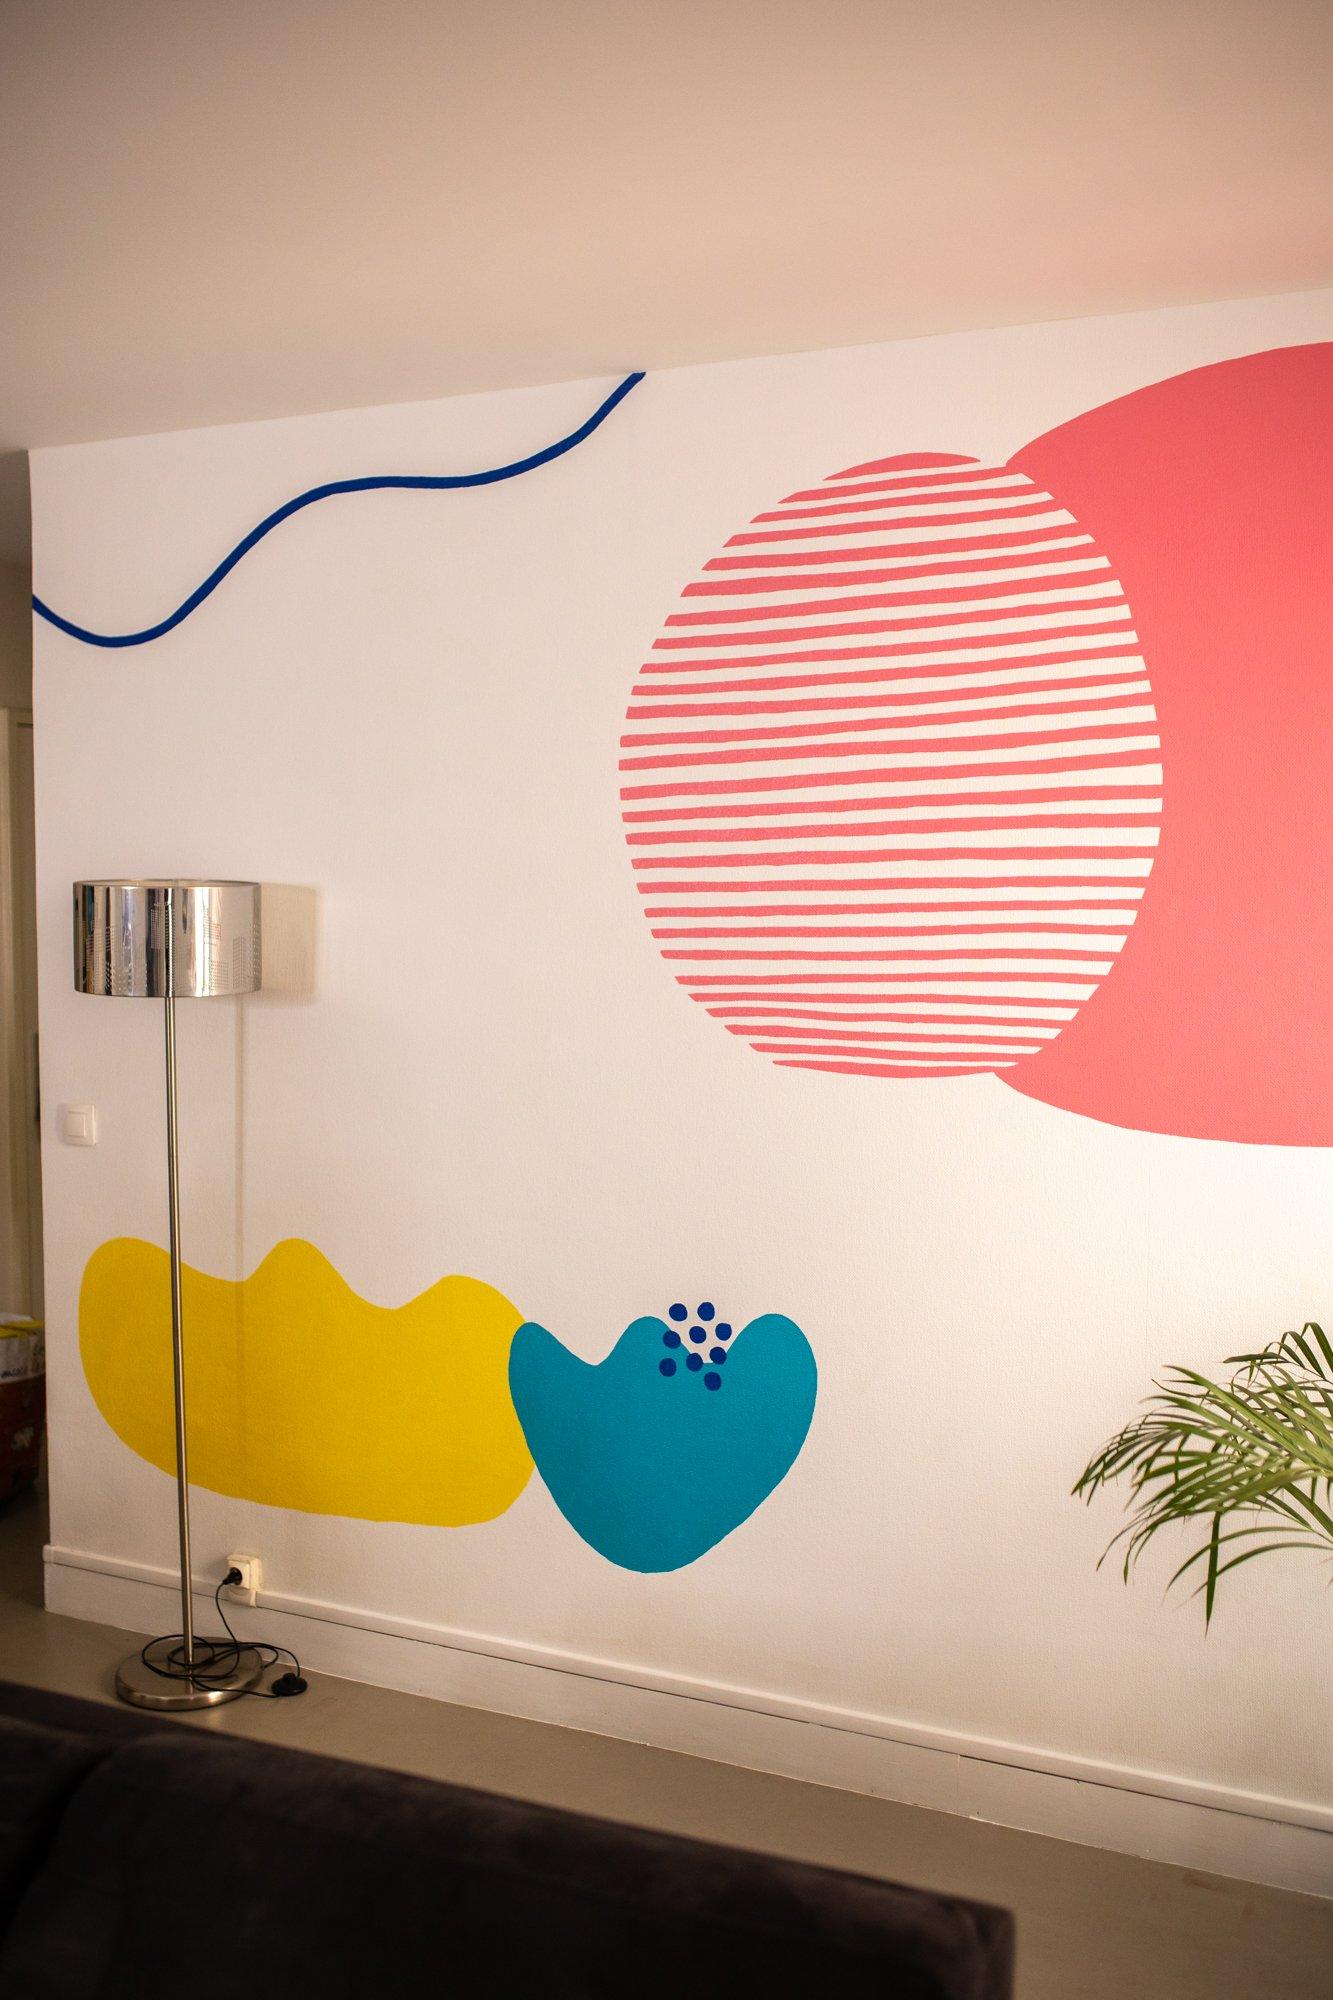 fresque murale création personnalisée / withalovelikethat.fr